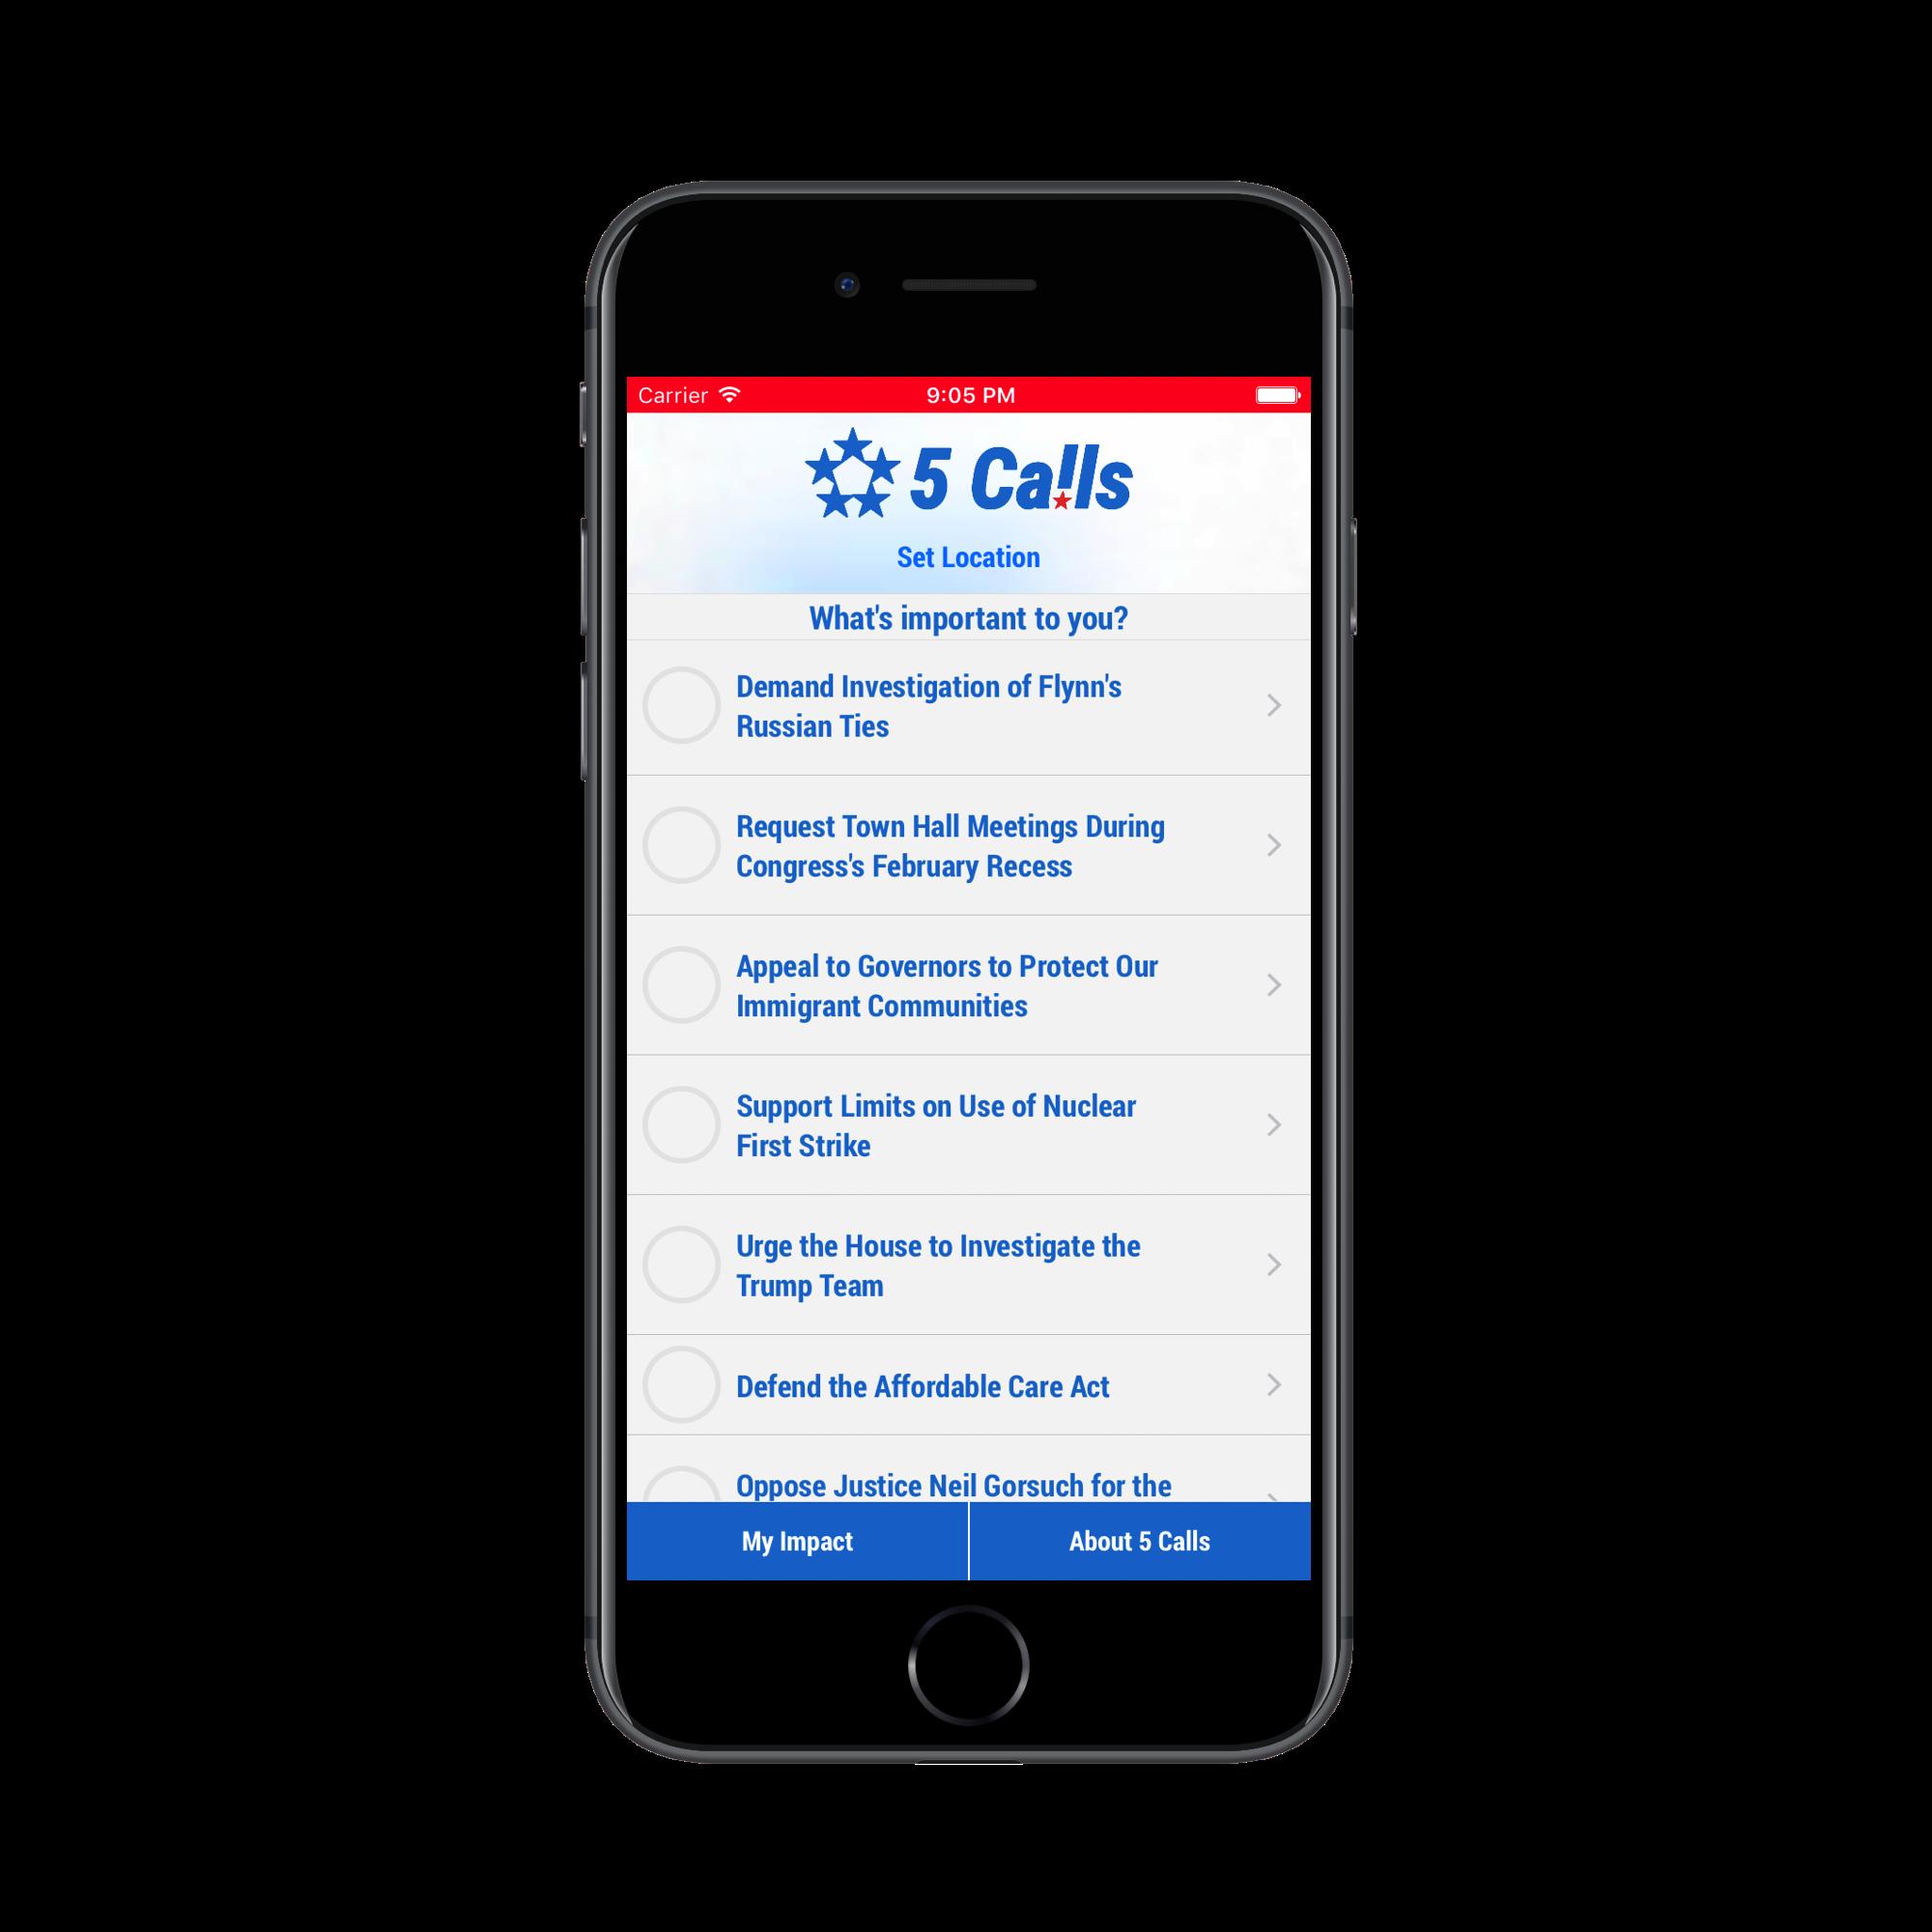 5 Calls - Issue List